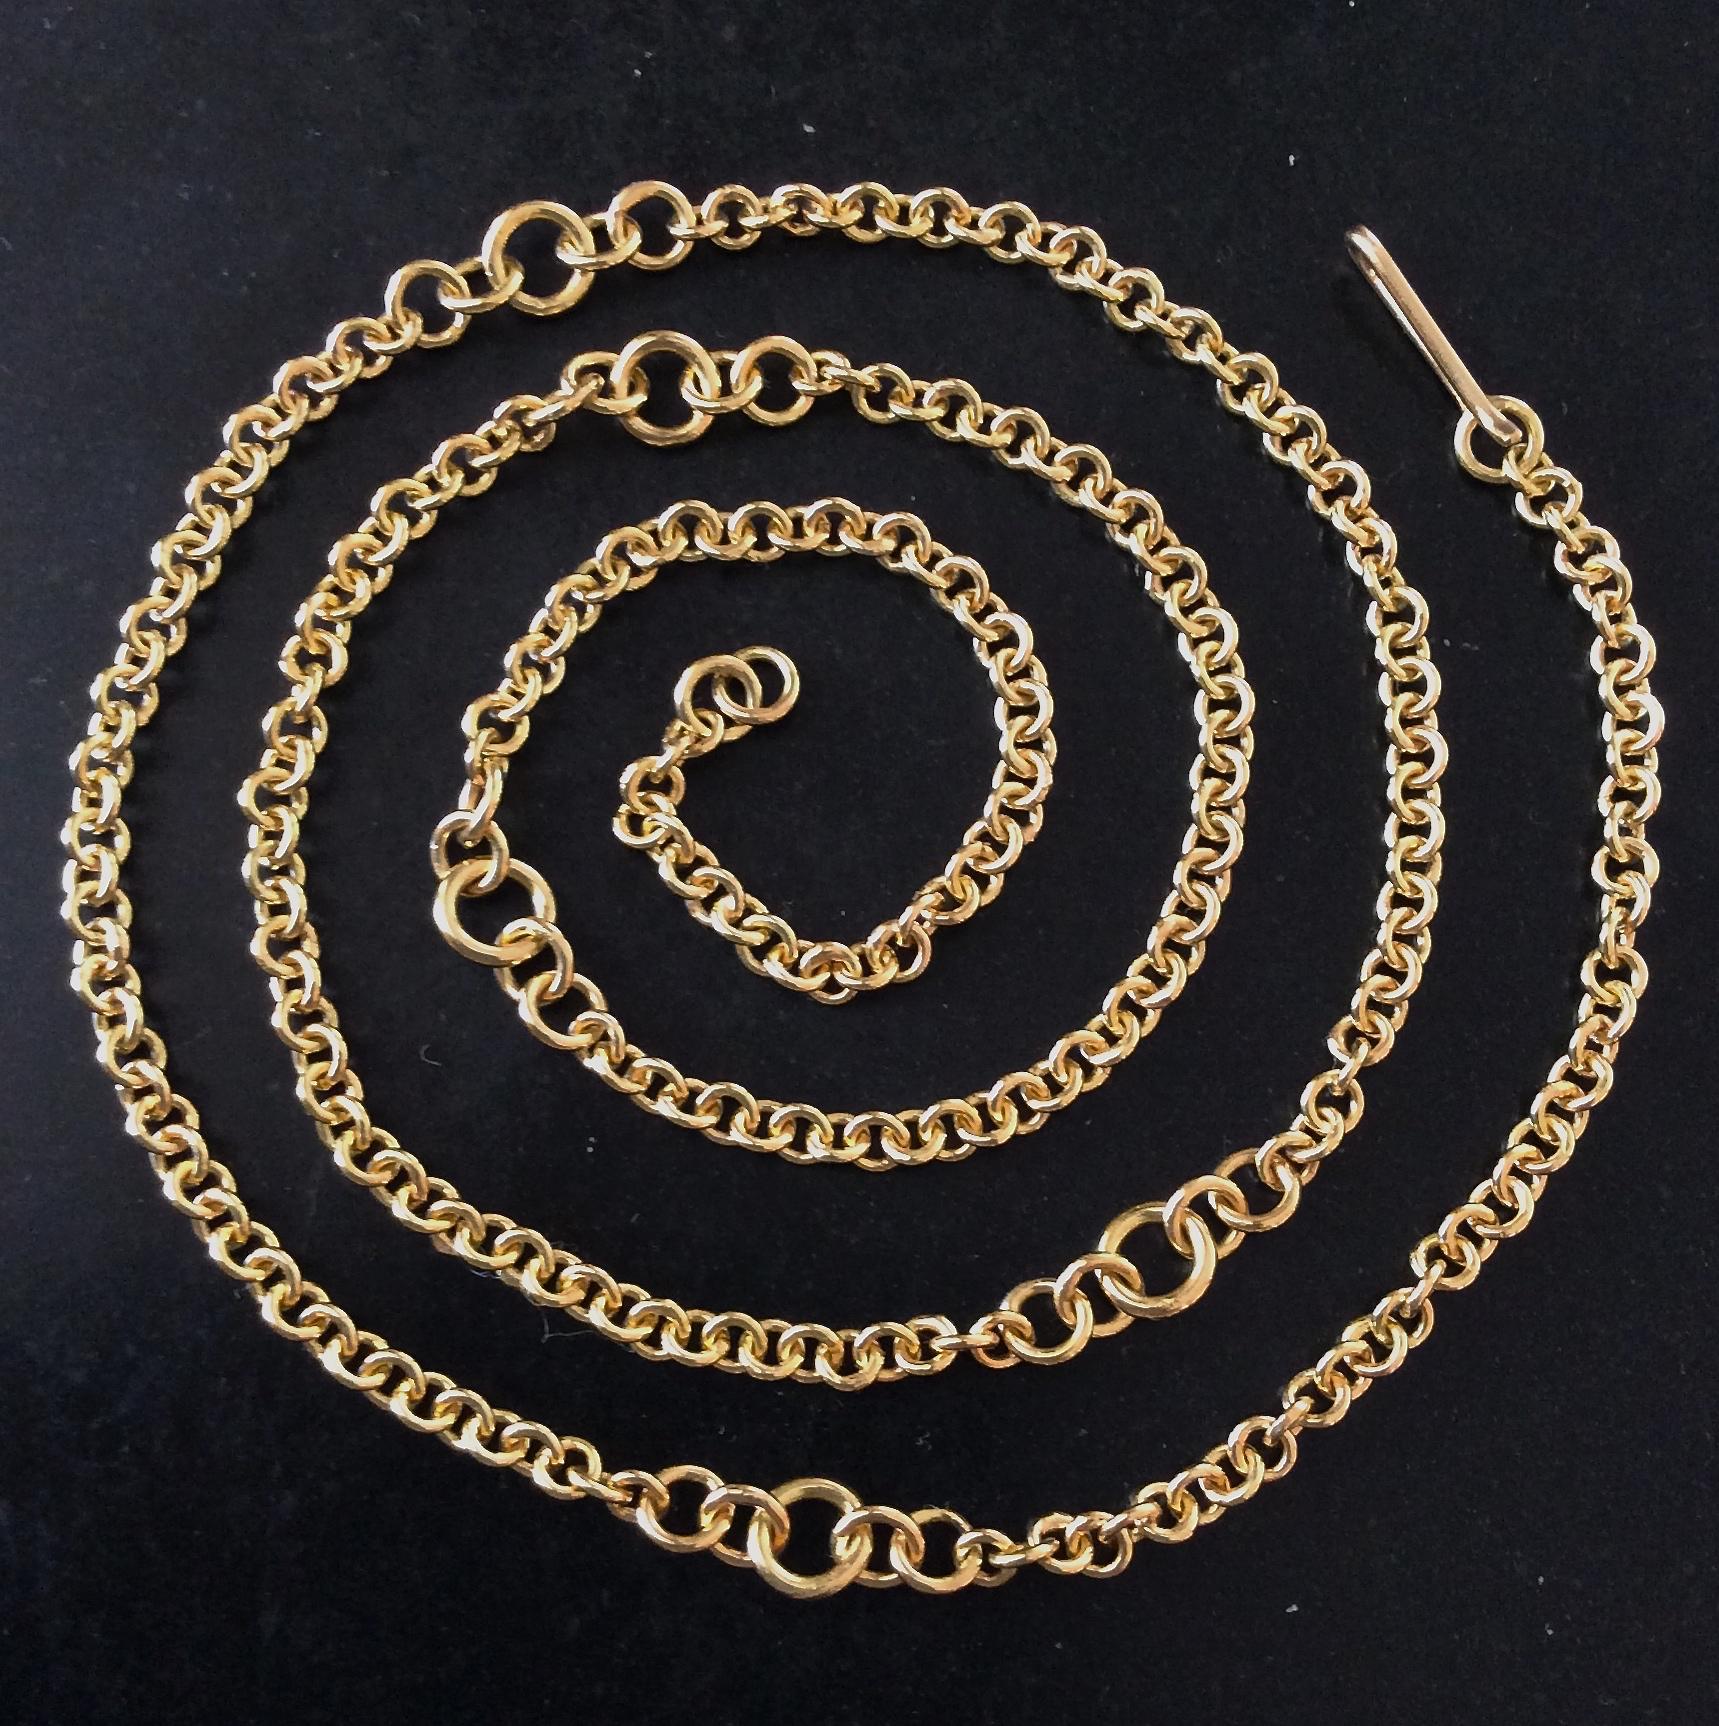 Handmade Gold Chain